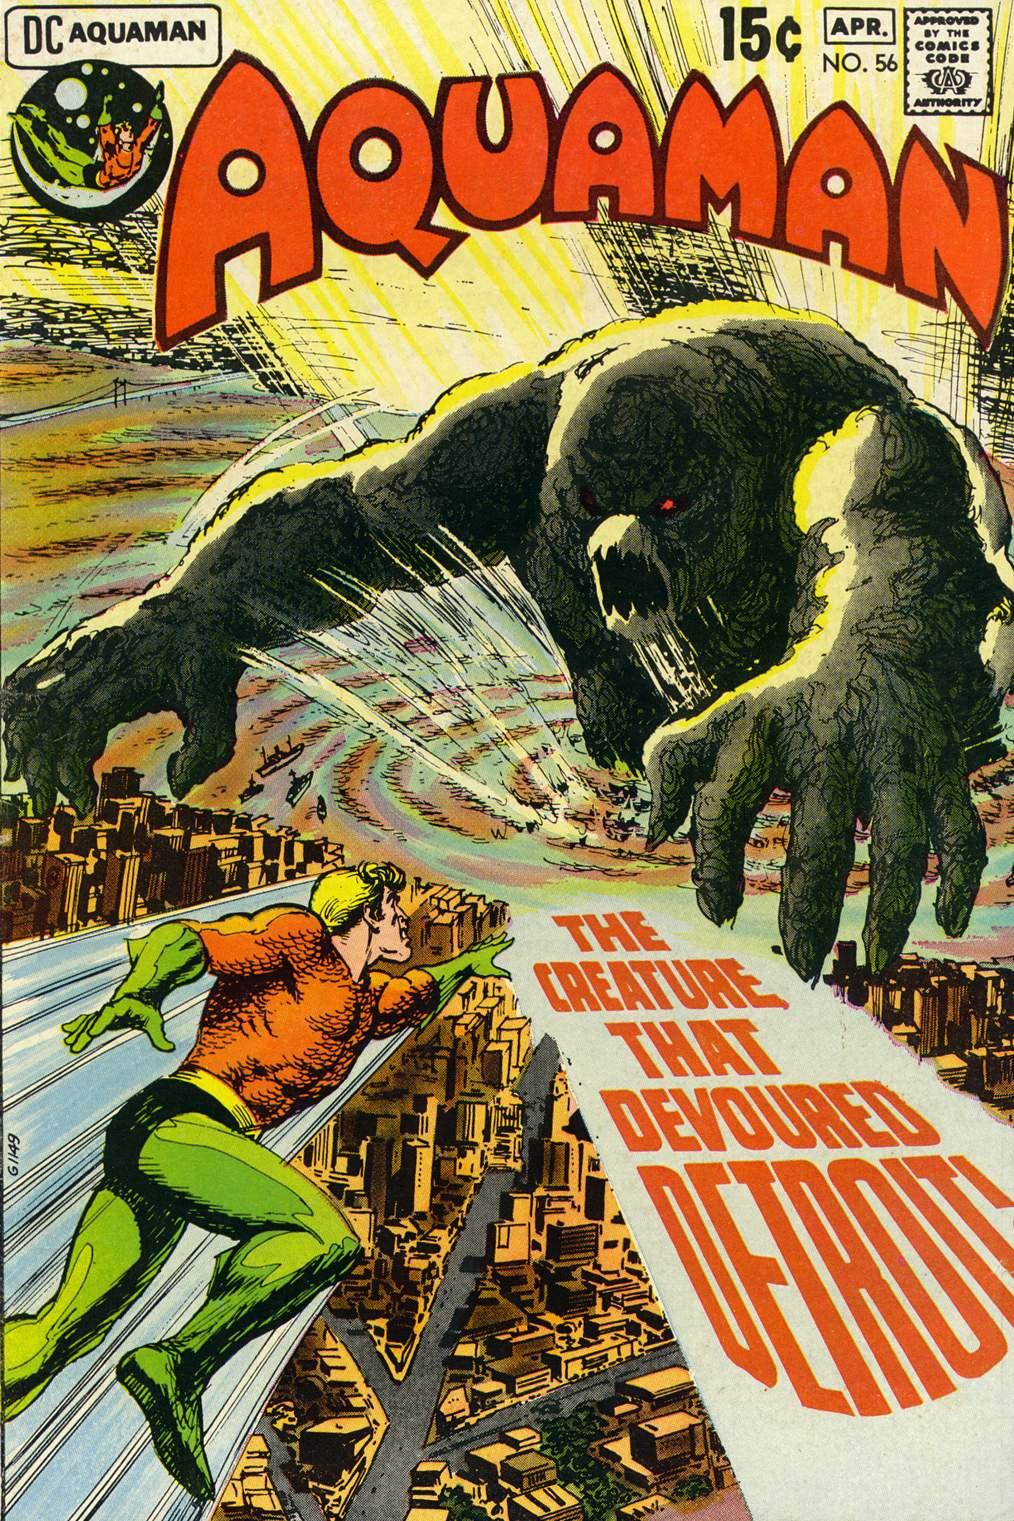 Read online Aquaman (1962) comic -  Issue #56 - 1